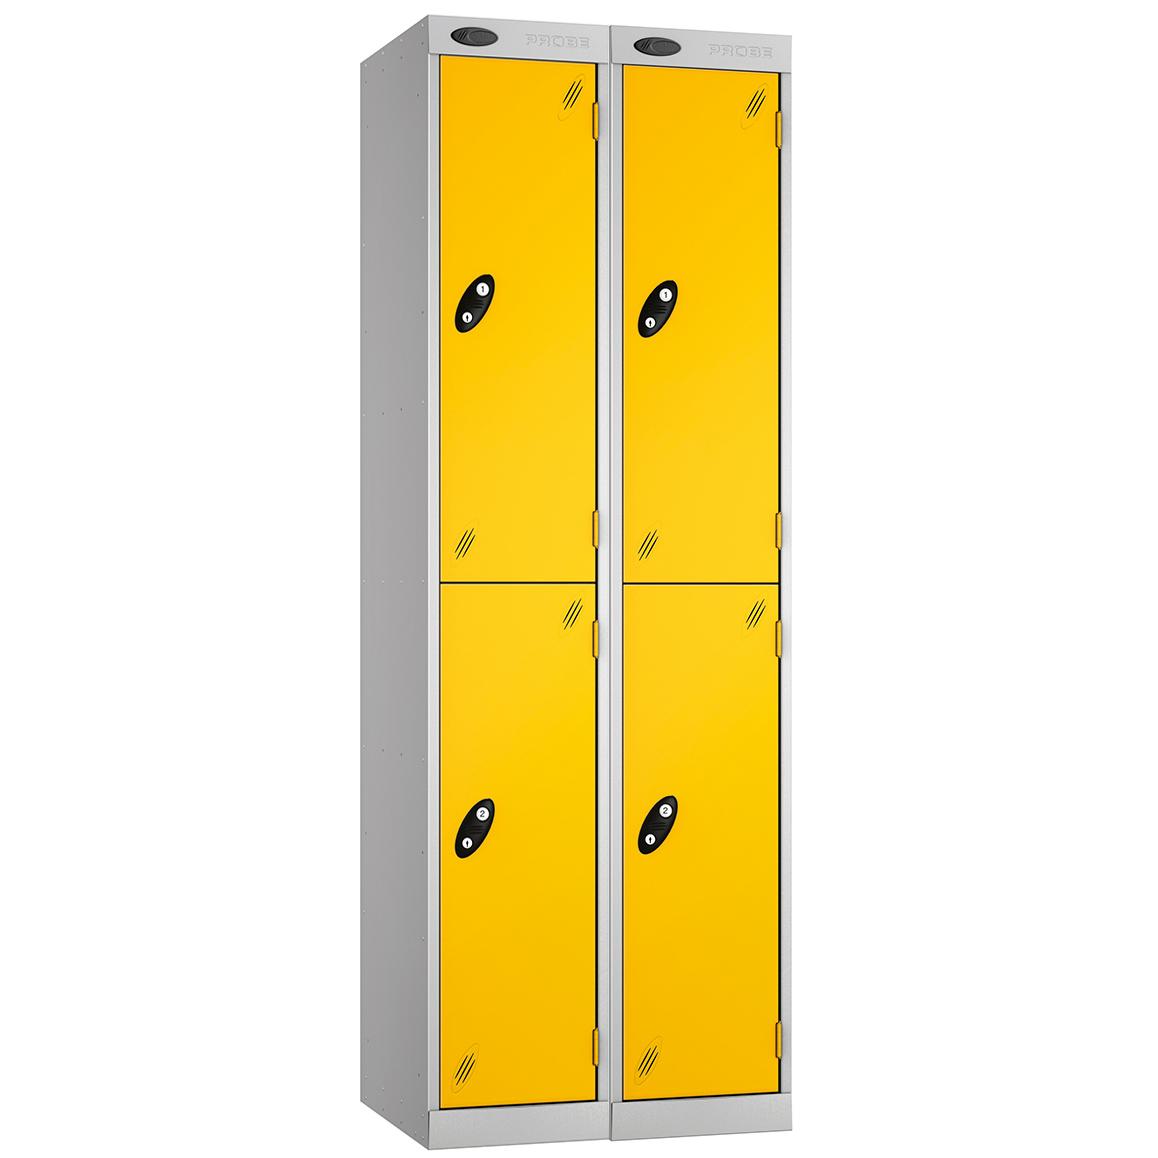 Probe Express Box Lockers - Nest 2 - 2 Tier Lockers